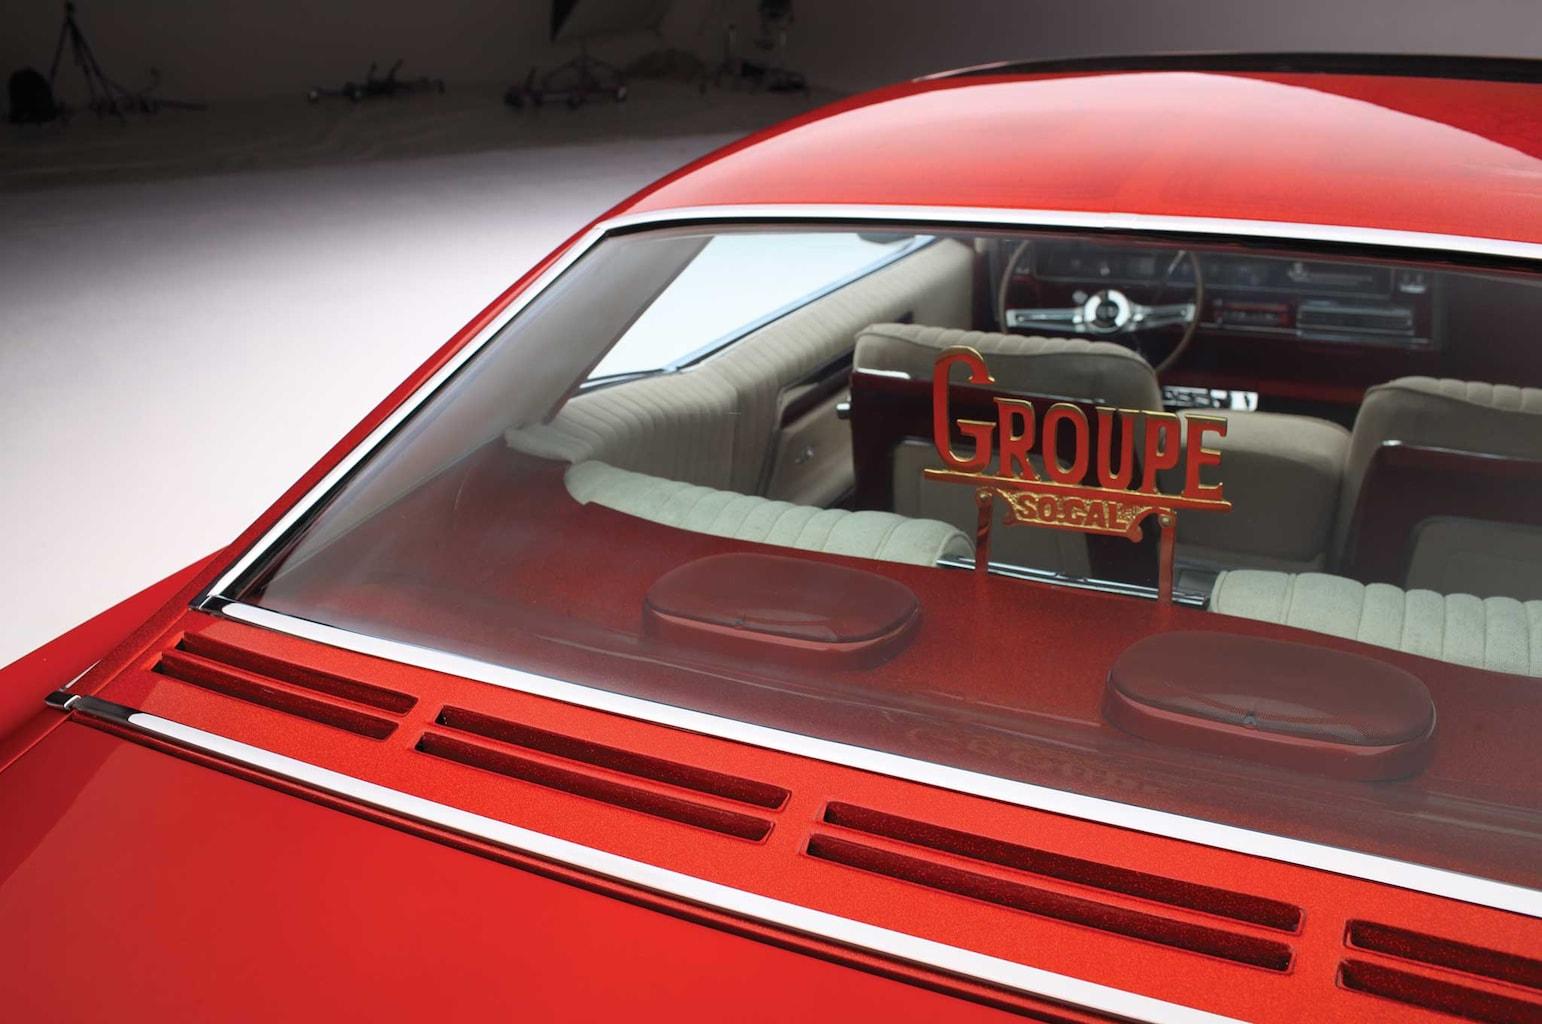 1967 buick riviera groupe club plaque 004